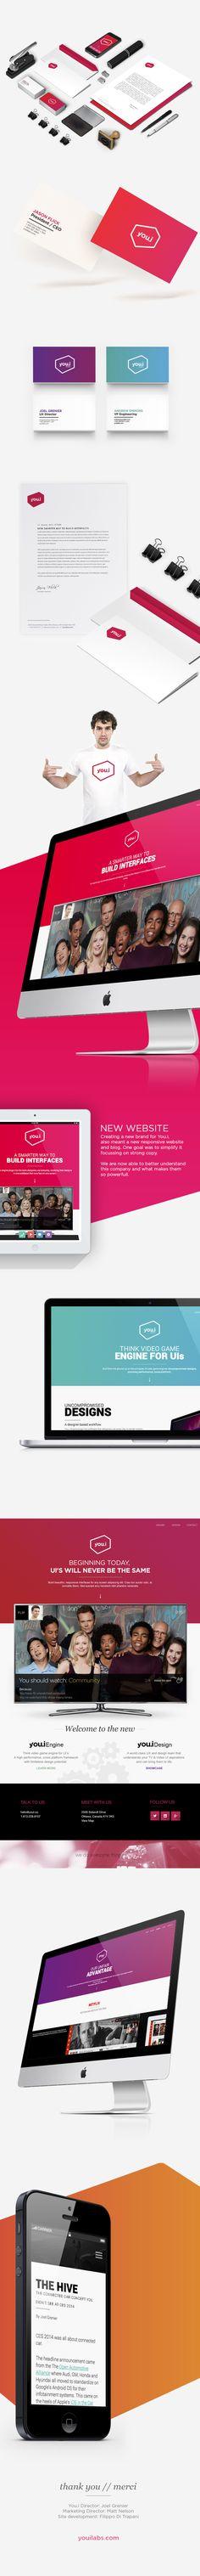 You.i - Rebrand by Pascal Potvin, via Behance